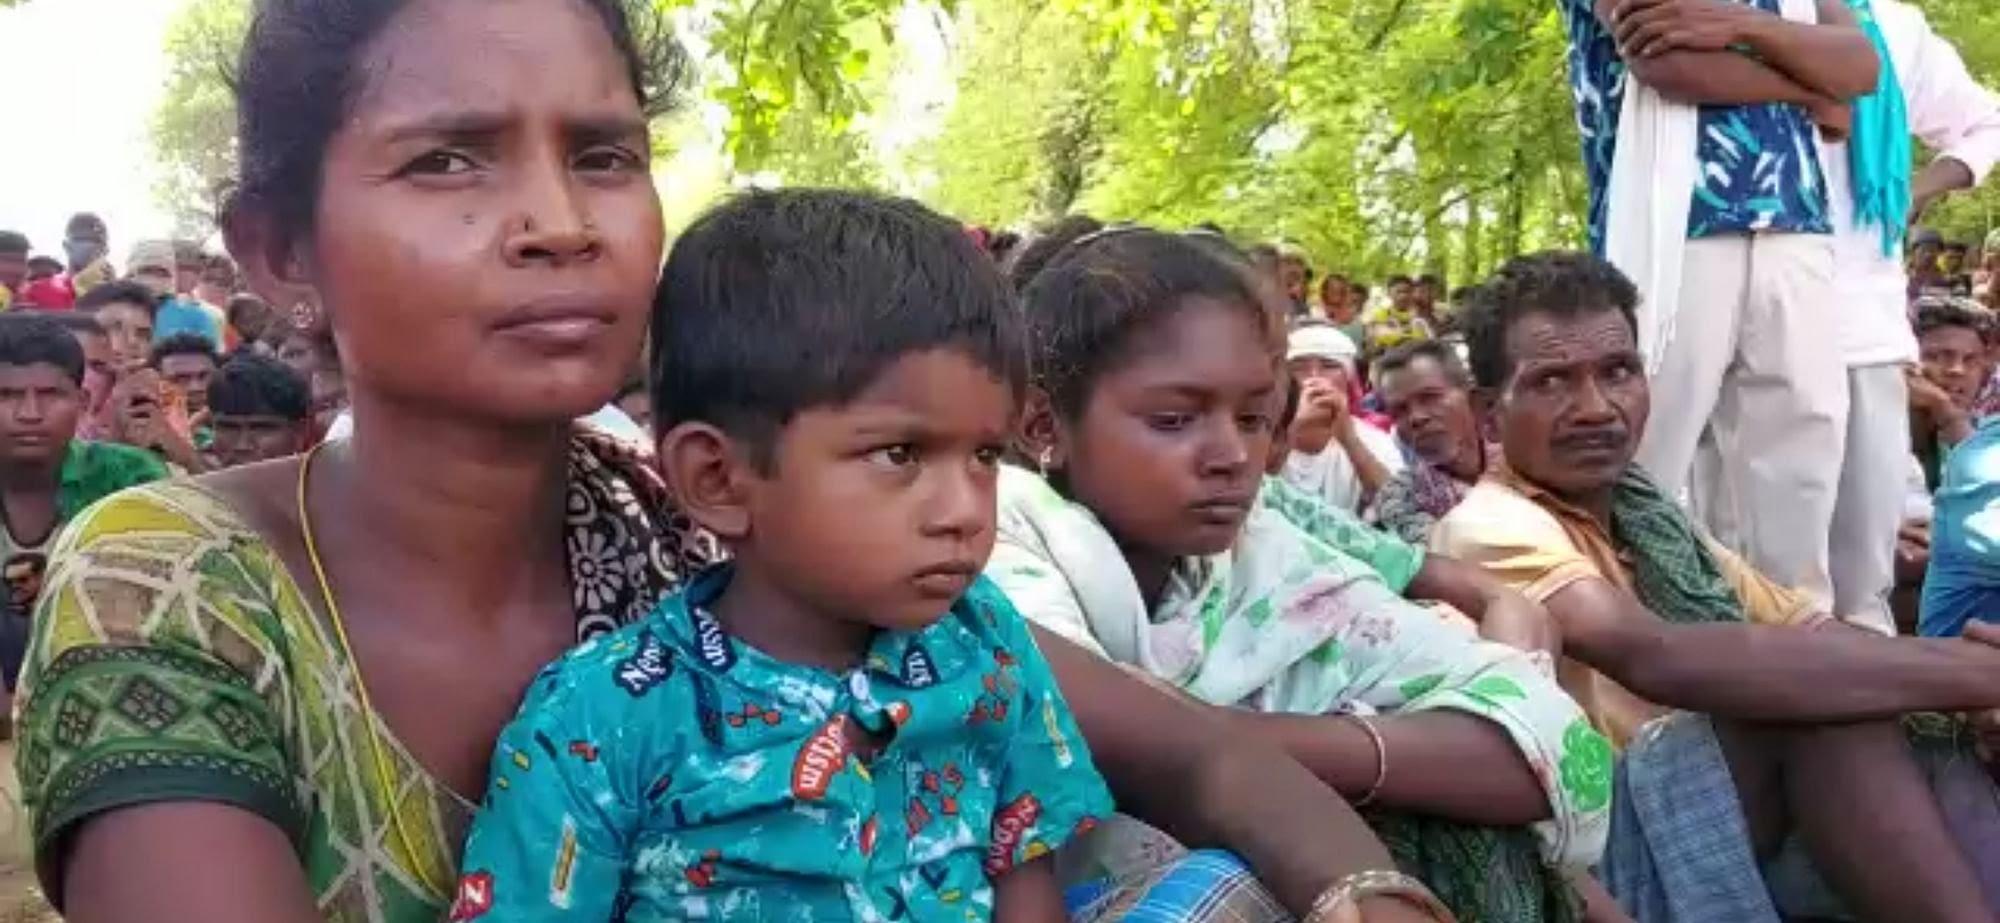 (Photo Courtesy: Vishnukant Tiwari)